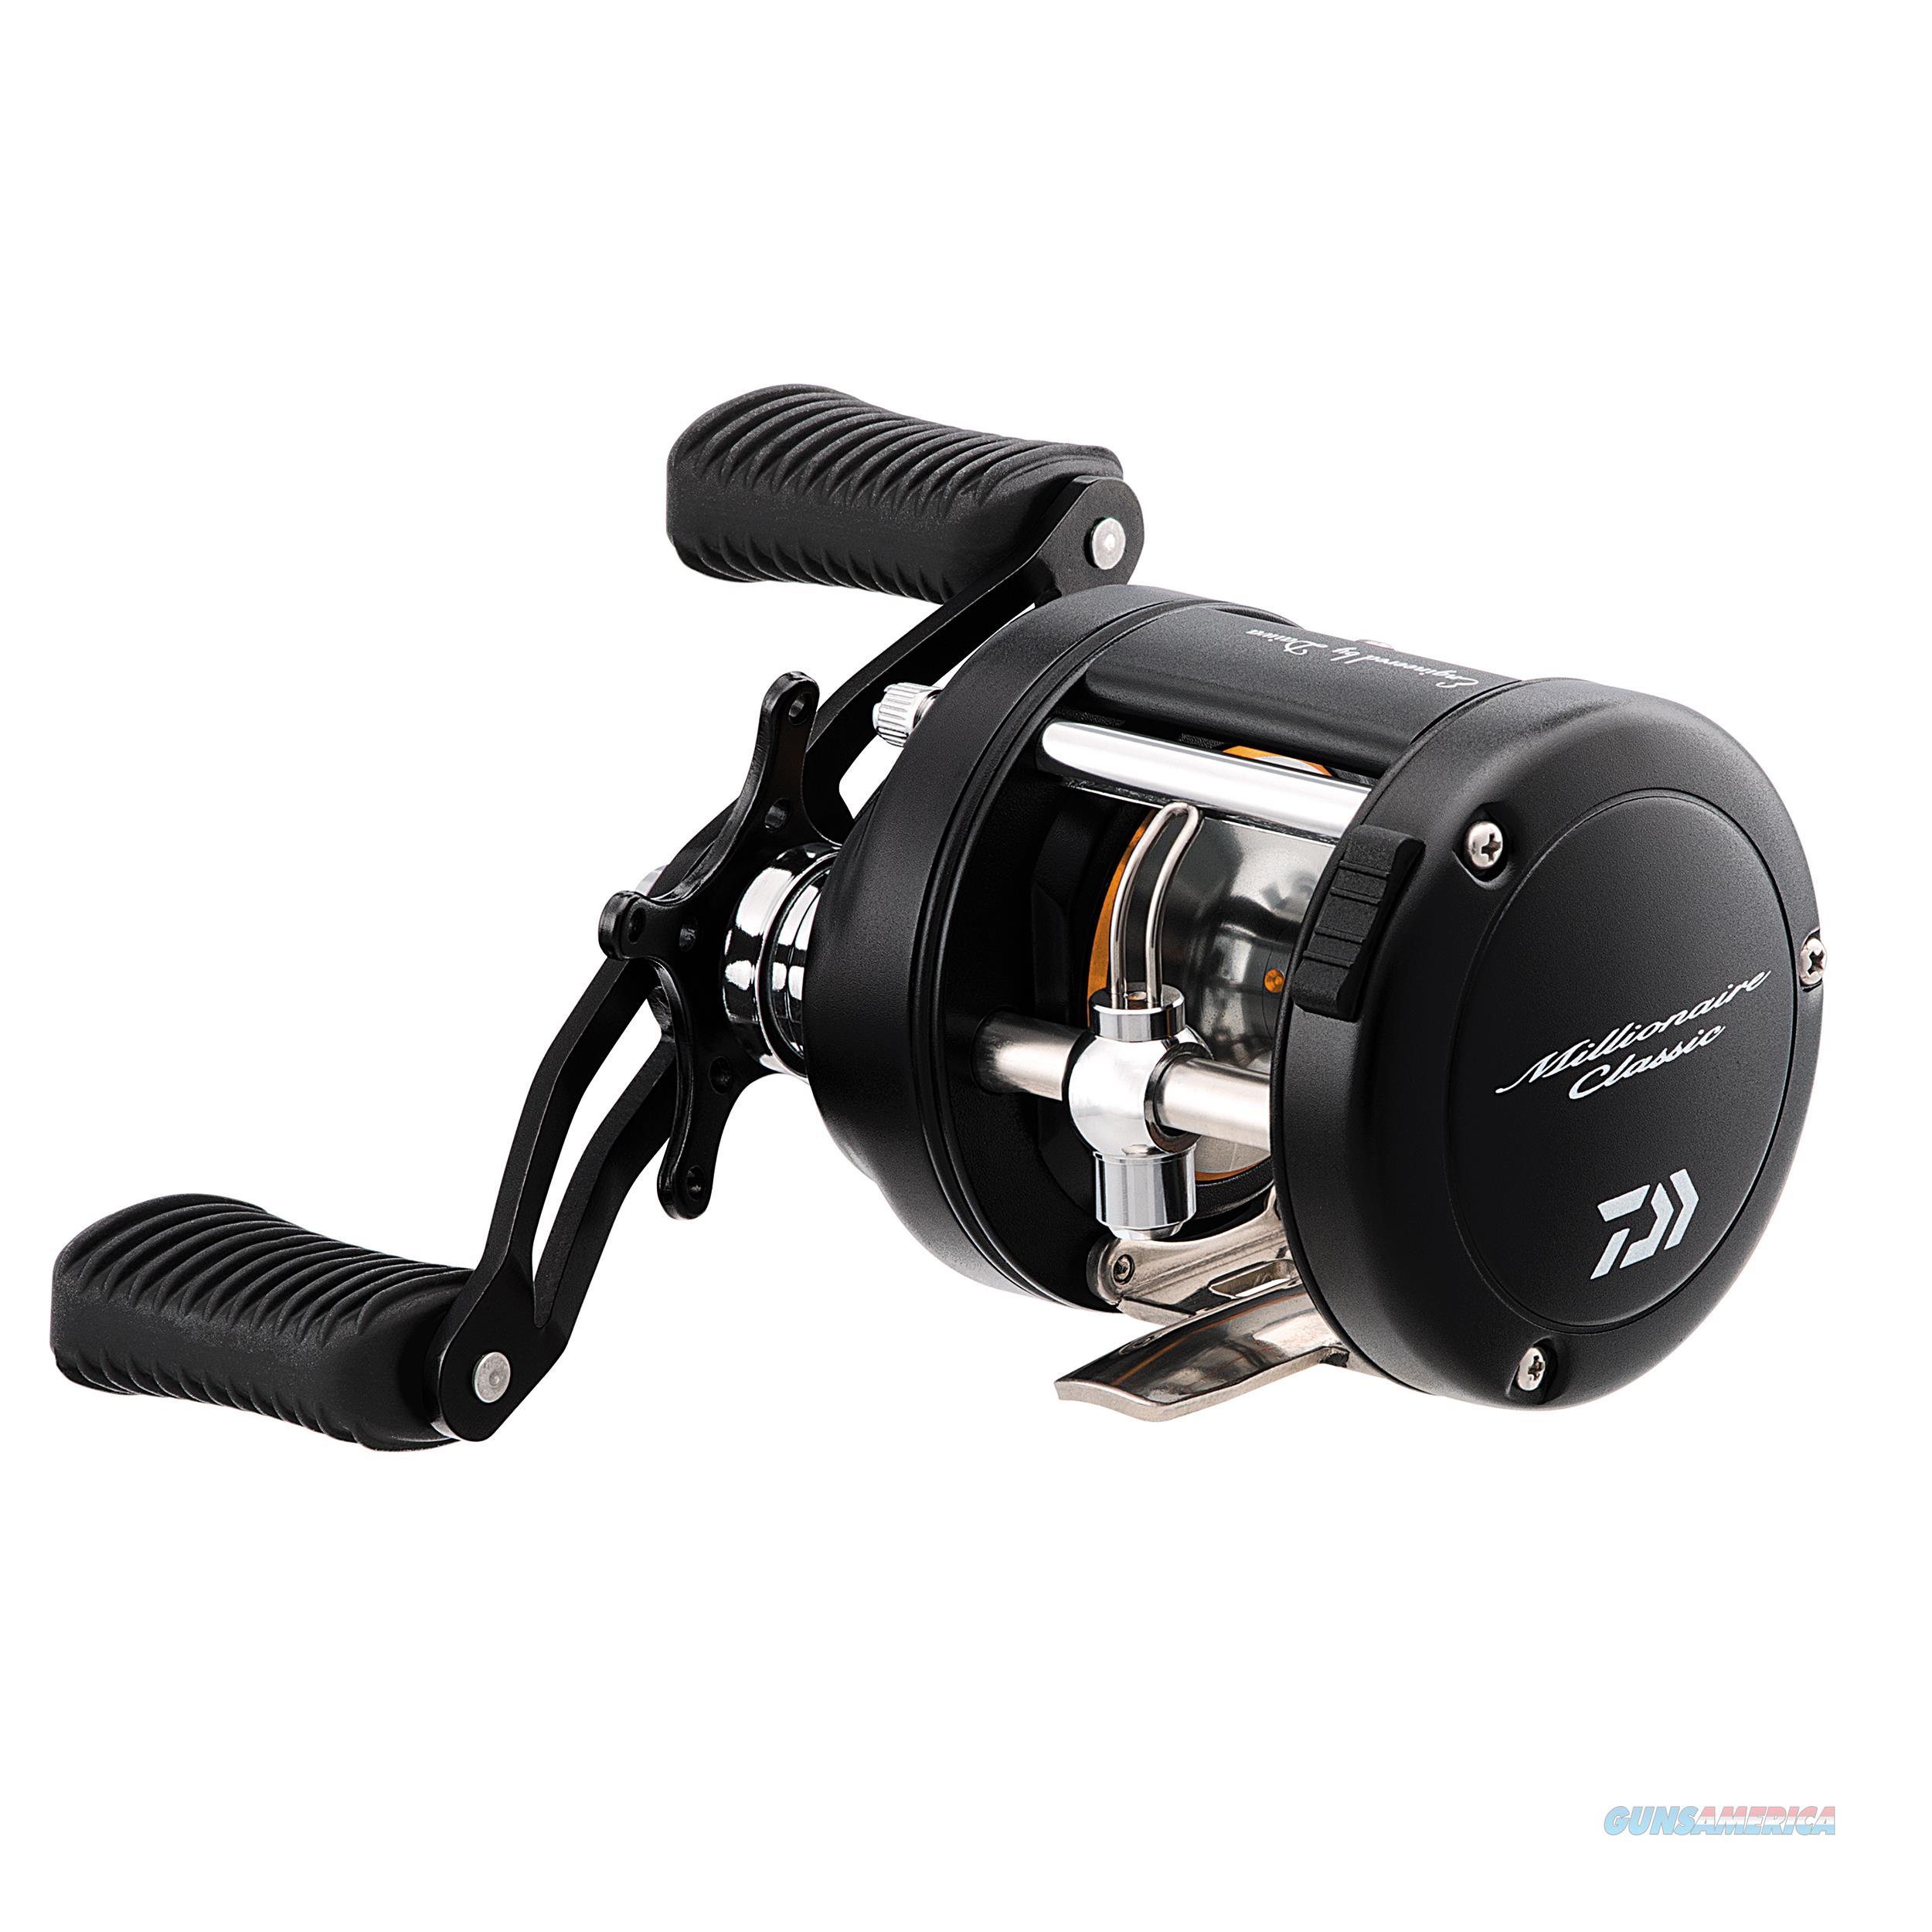 Daiwa Millionaire Classic Utd Casting Reel M-CUTD250  Non-Guns > Fishing/Spearfishing